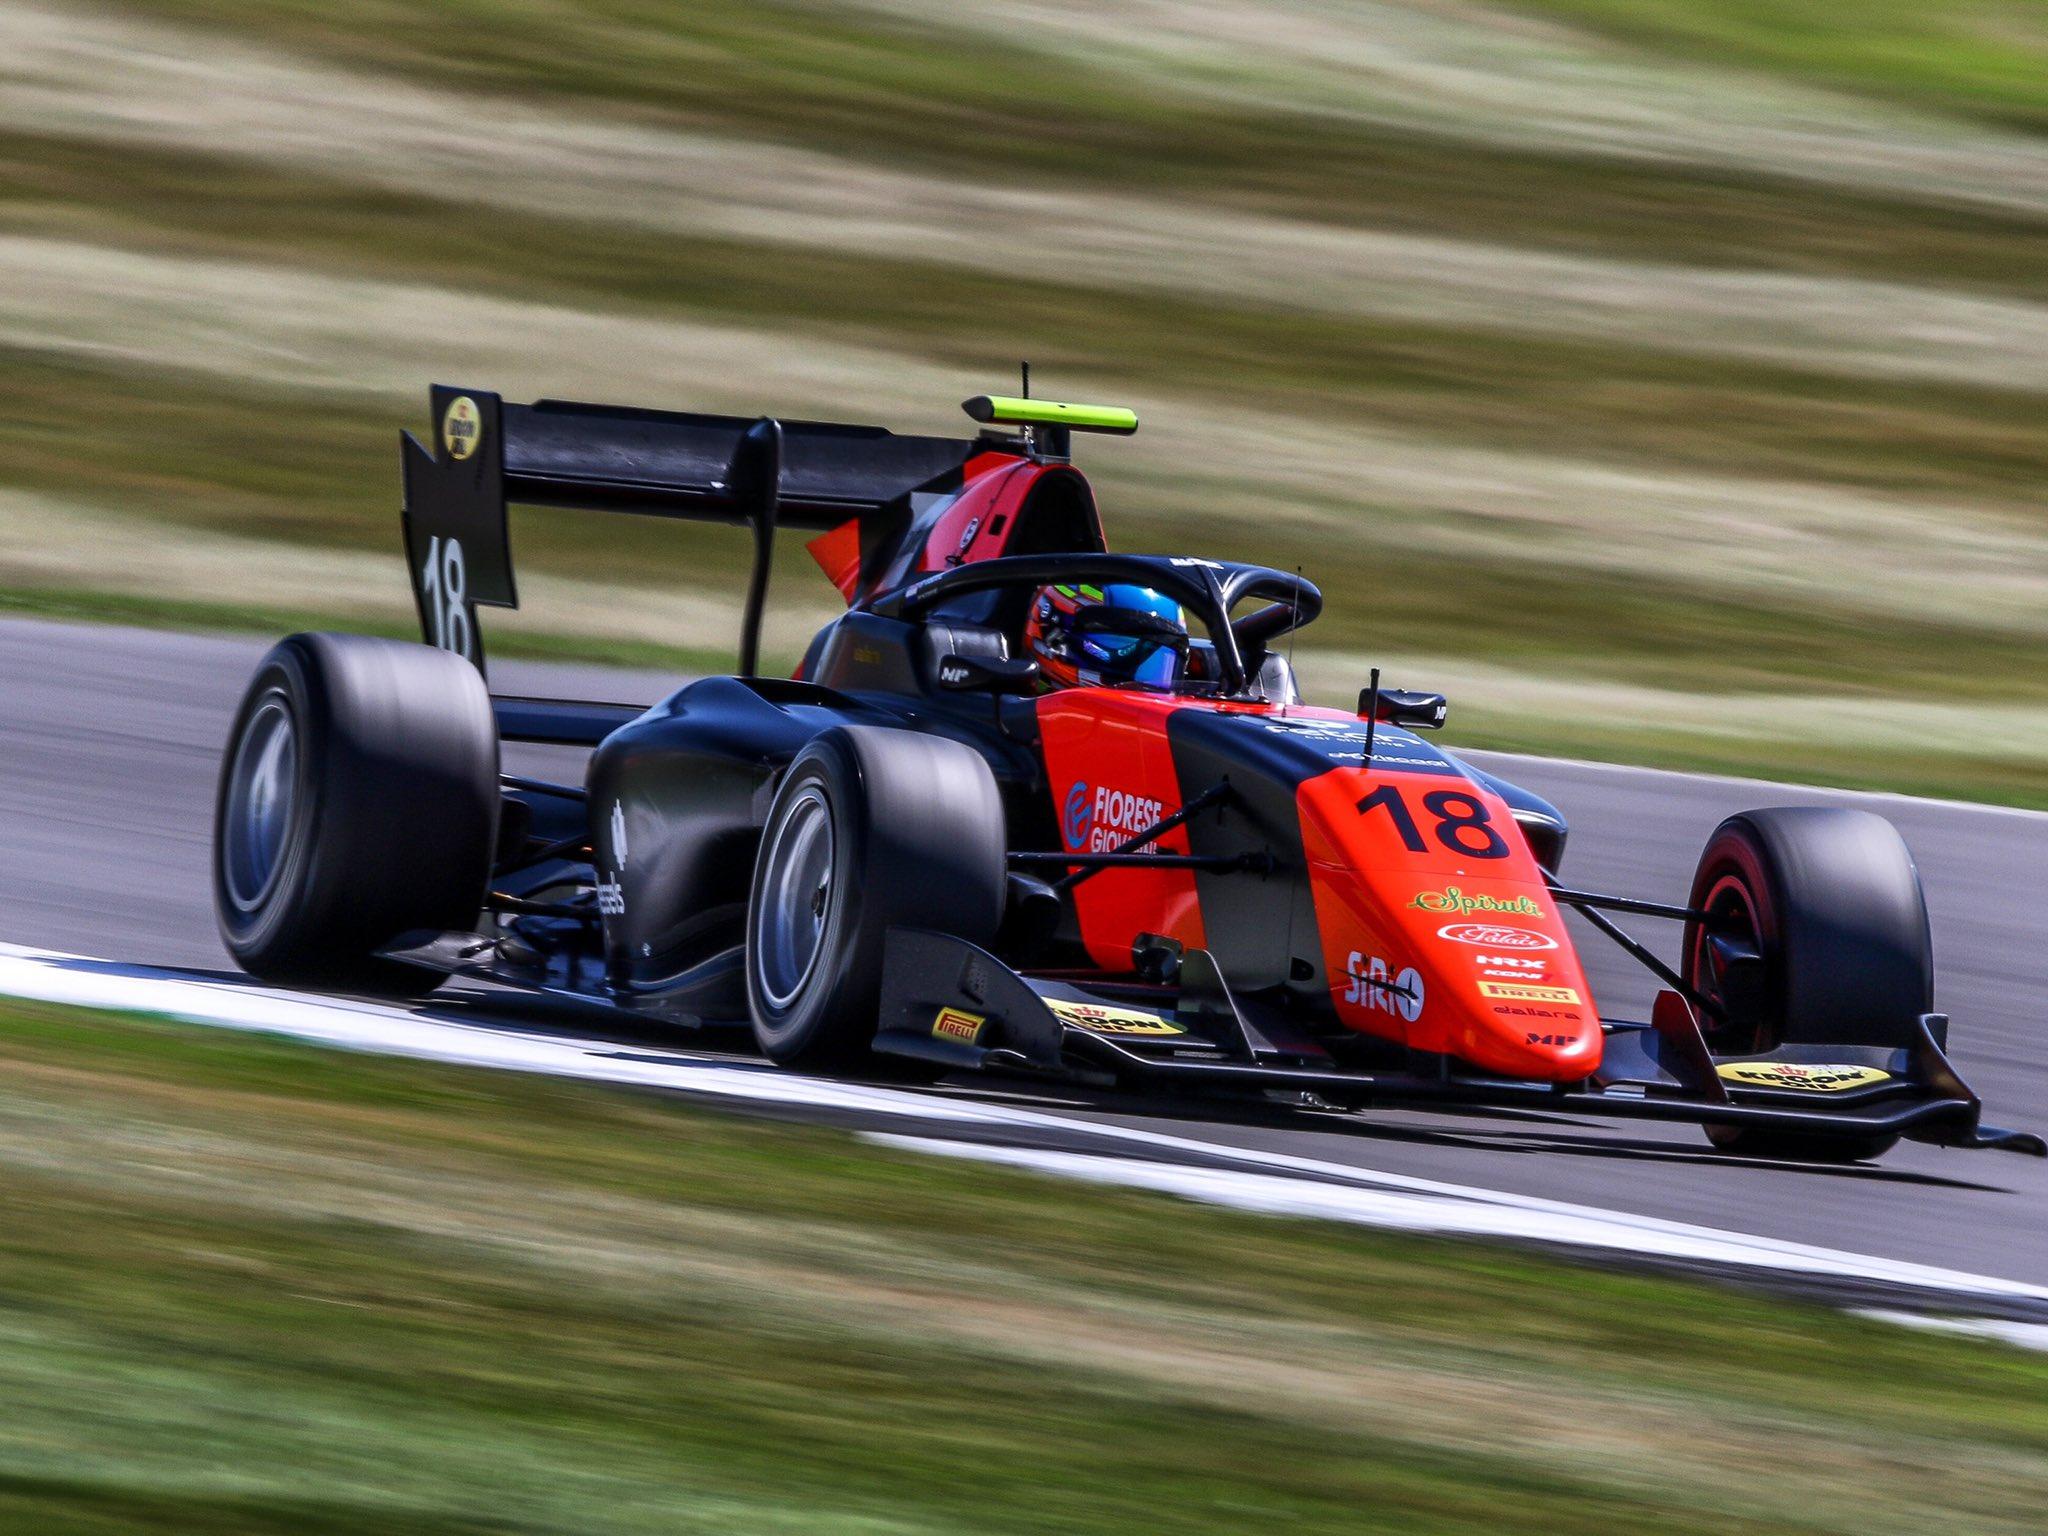 F3, Viscaal, MP Motorsport